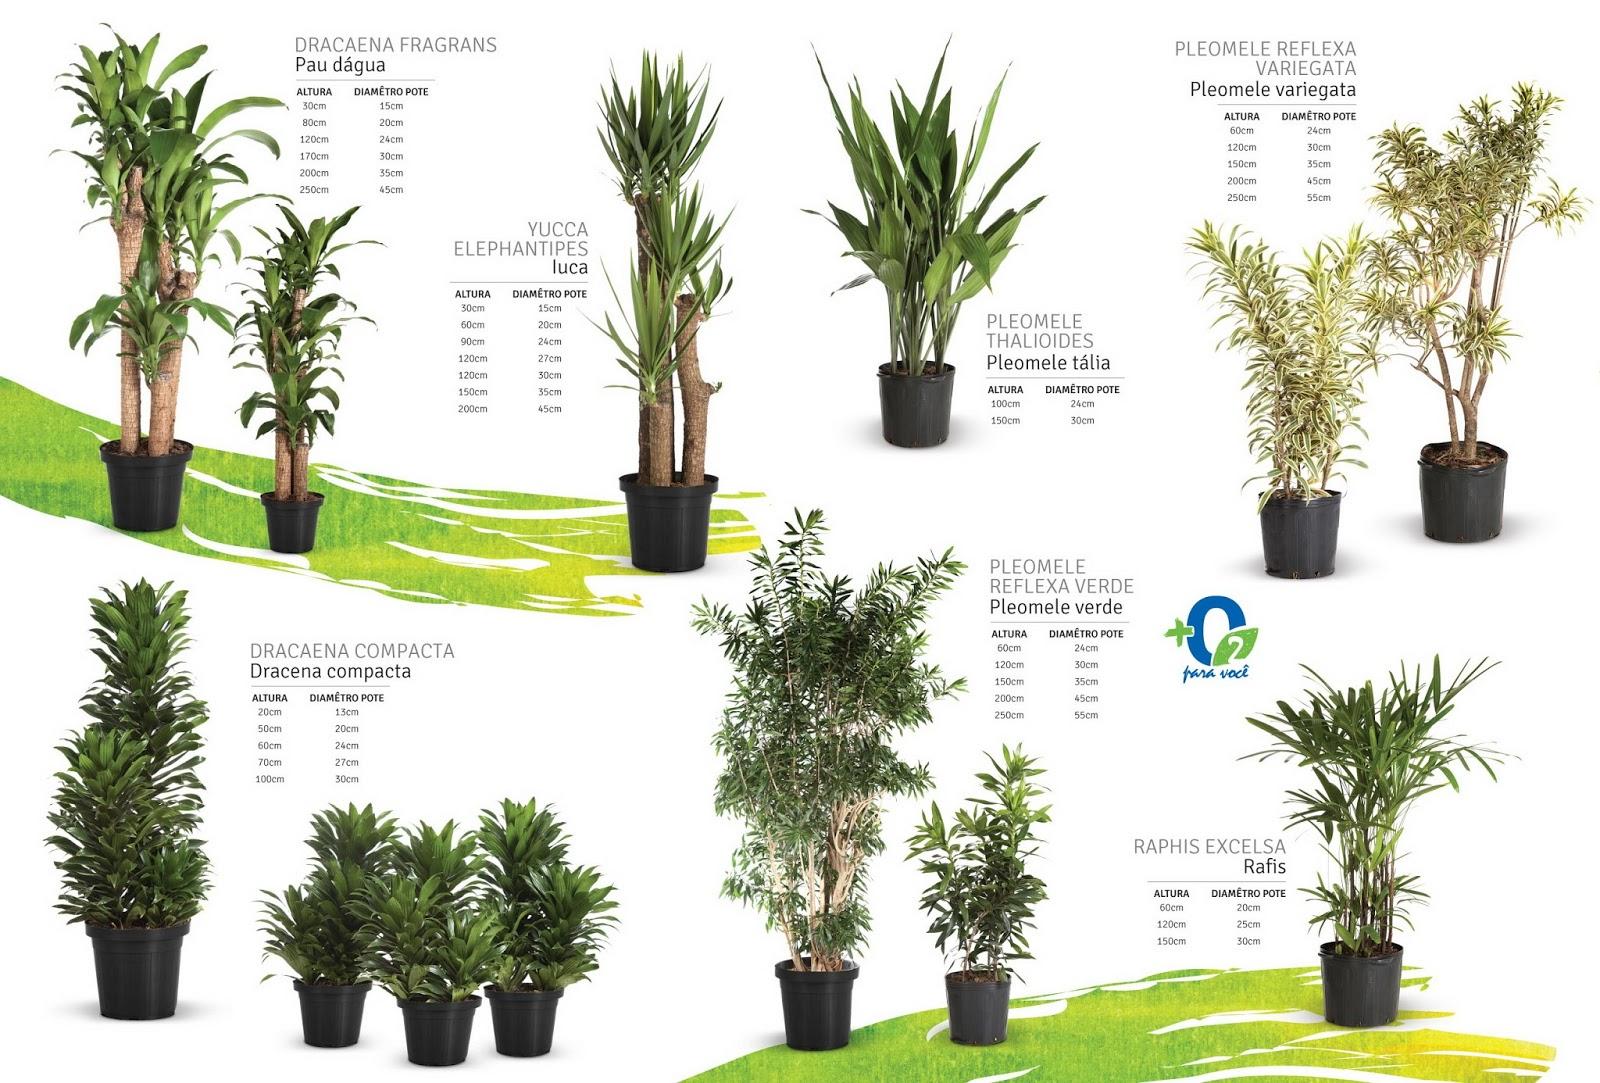 Catalogo mostra os principais produtos boa vista plantas for Plantas de interior ikea